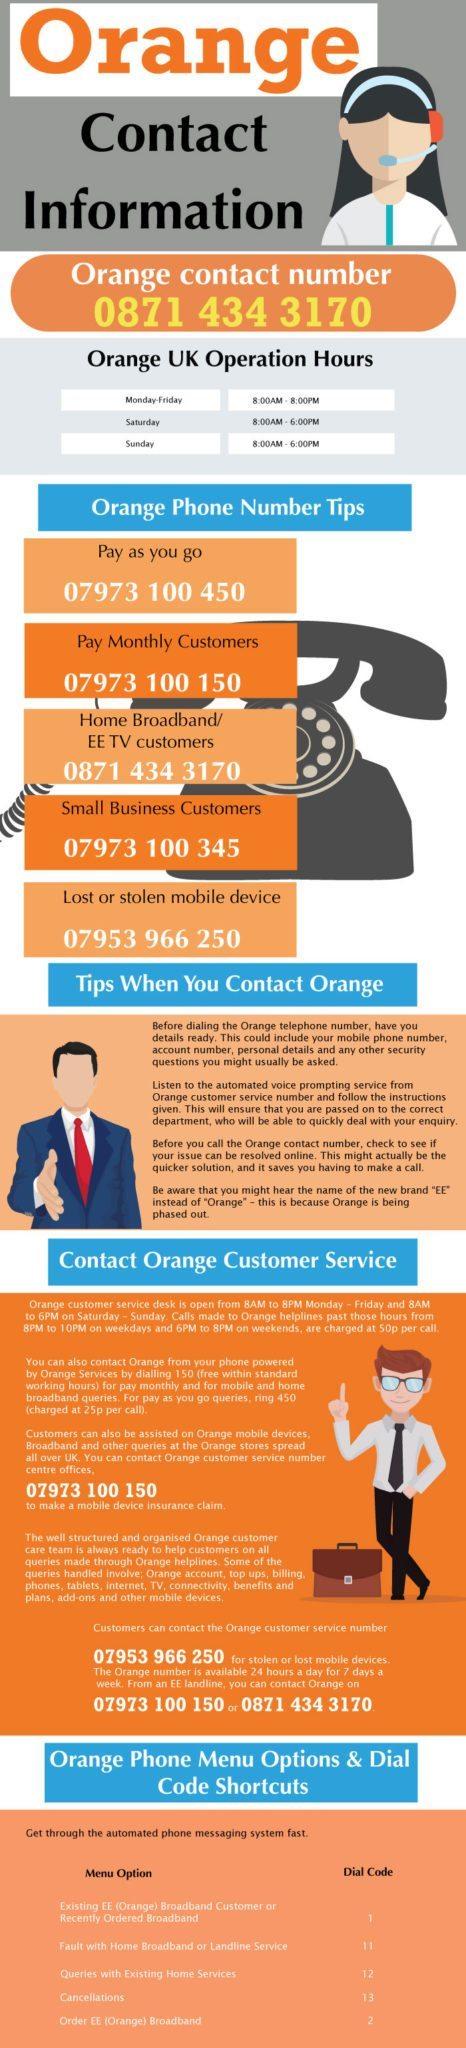 Orange customer services